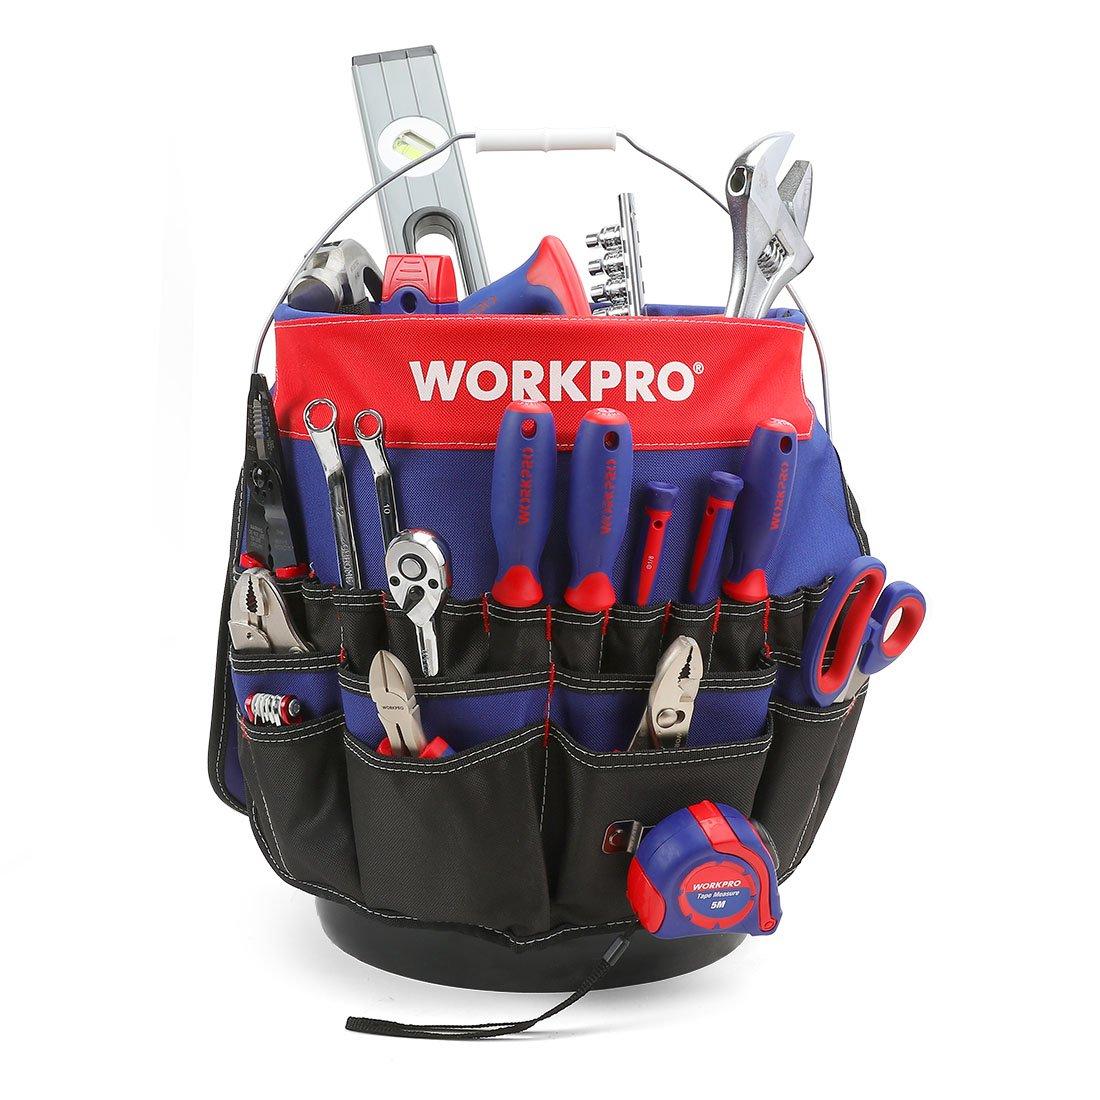 WORKPRO Bucket Tool Organizer with 51 Pockets